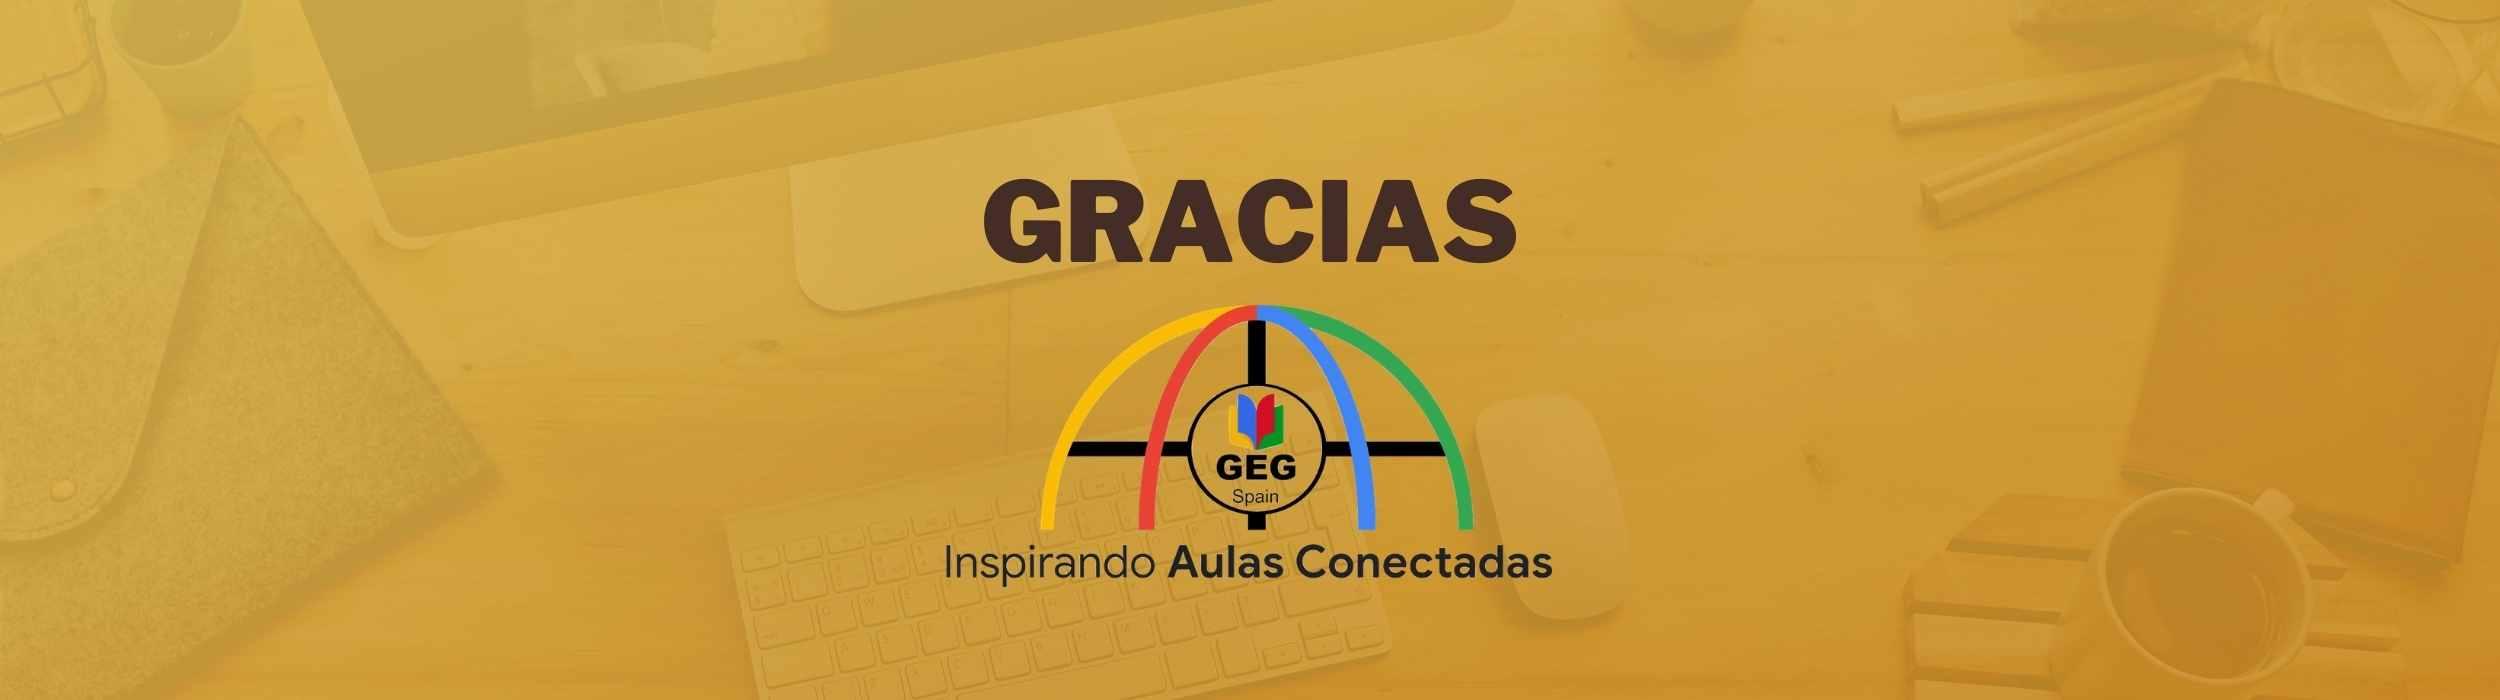 GRACIAS GEG